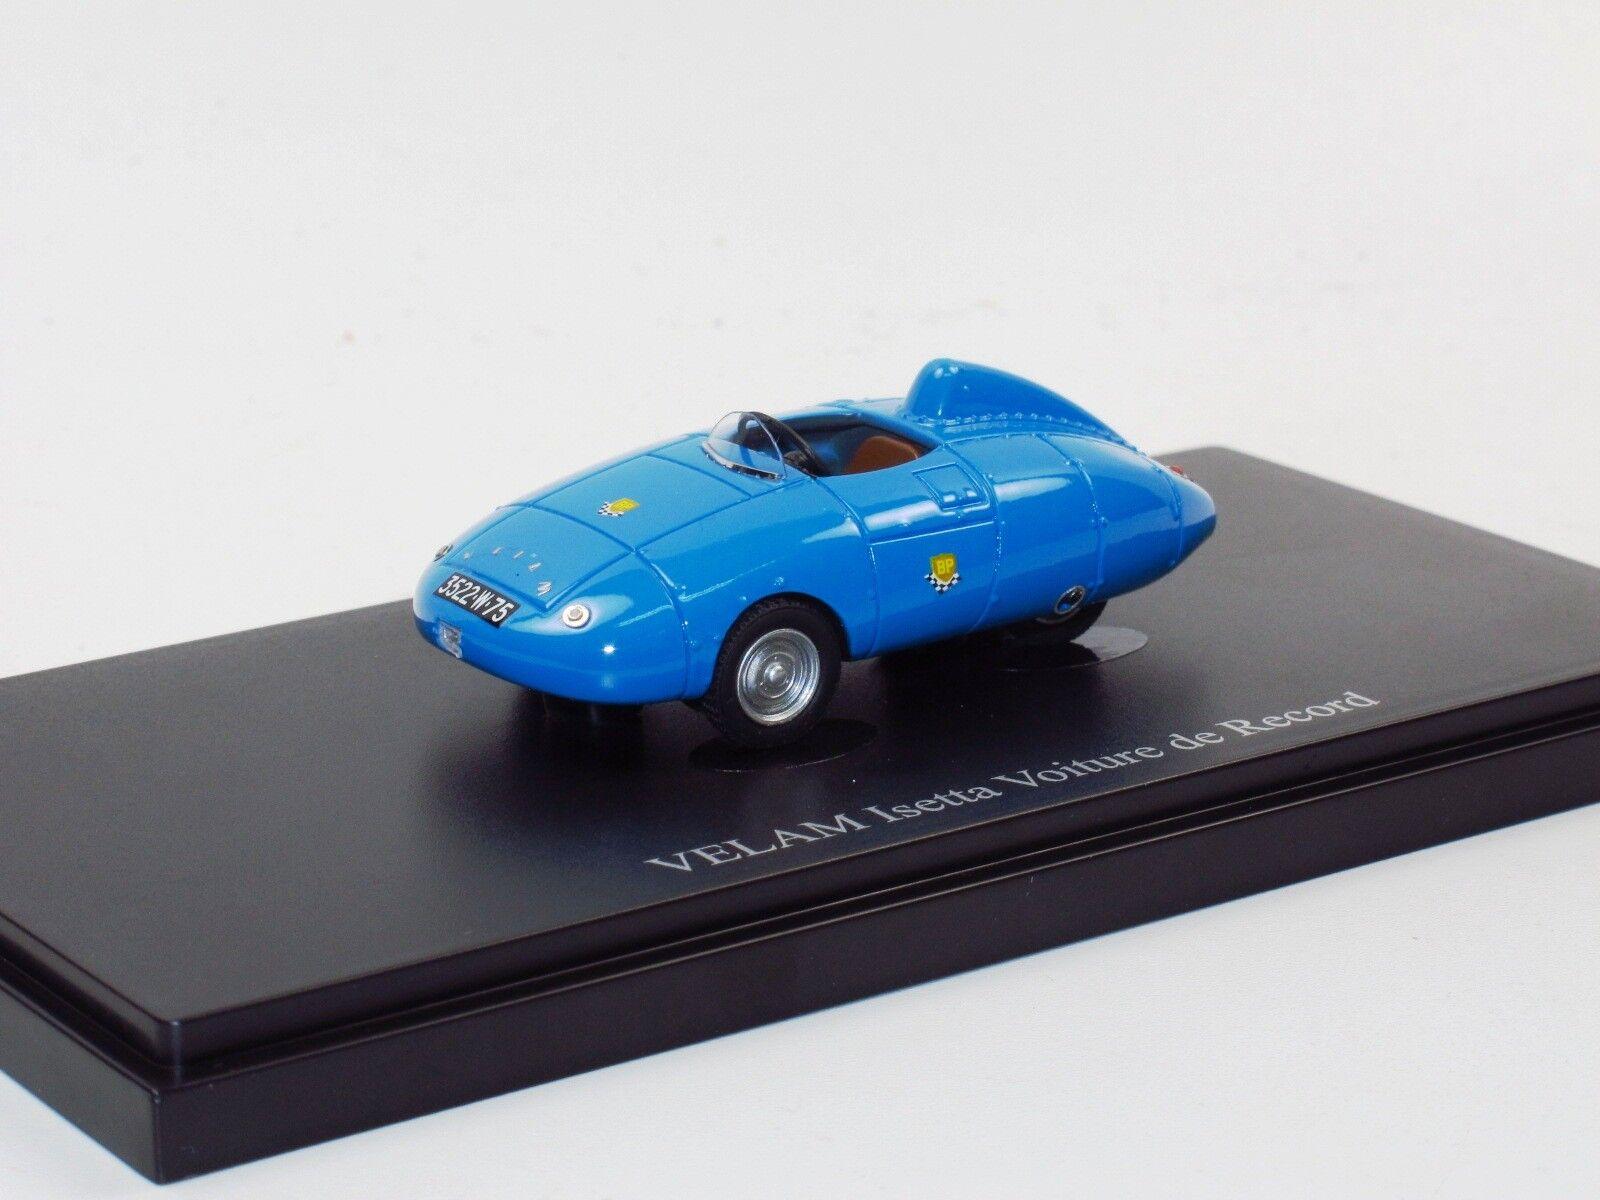 AutoCult AutoCult AutoCult 07009 - Velam Isetta Rekordwagen Record Car Voiture de Record 1957 1 43 fcc459